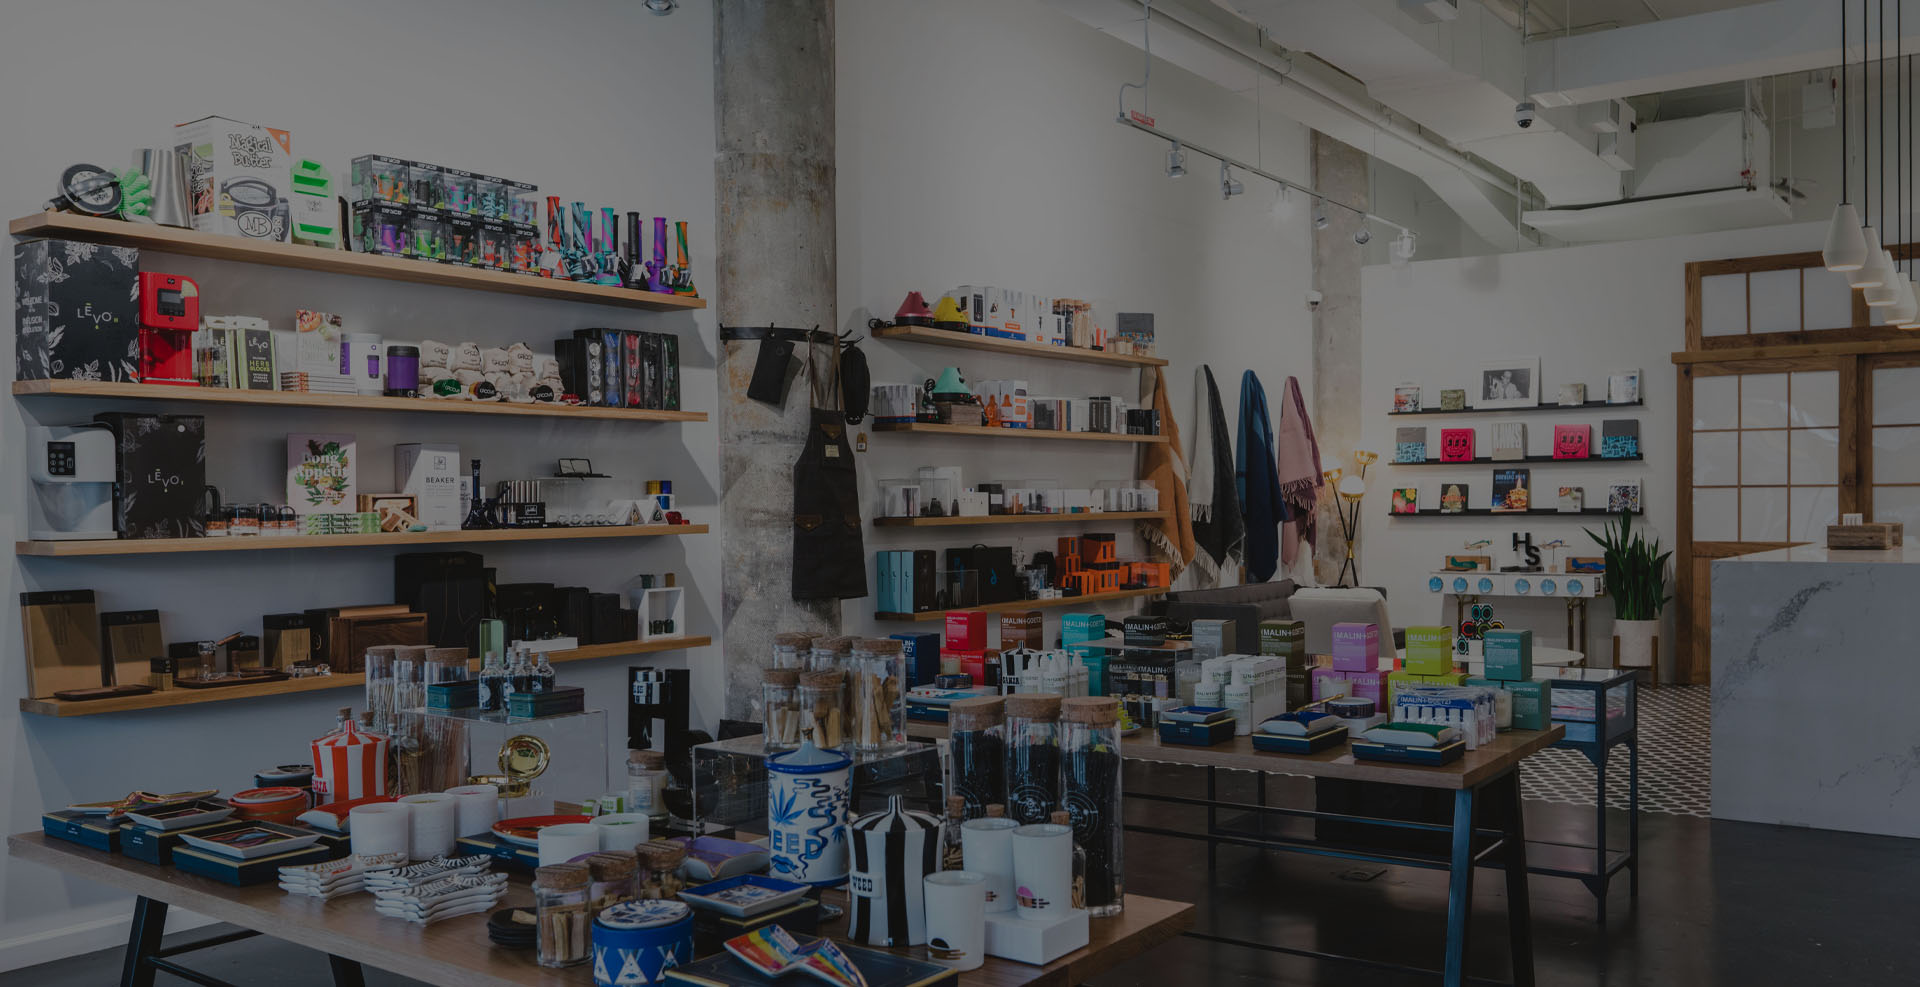 Greenlane: Leading Distributor to Dispensaries & Smoke Shops